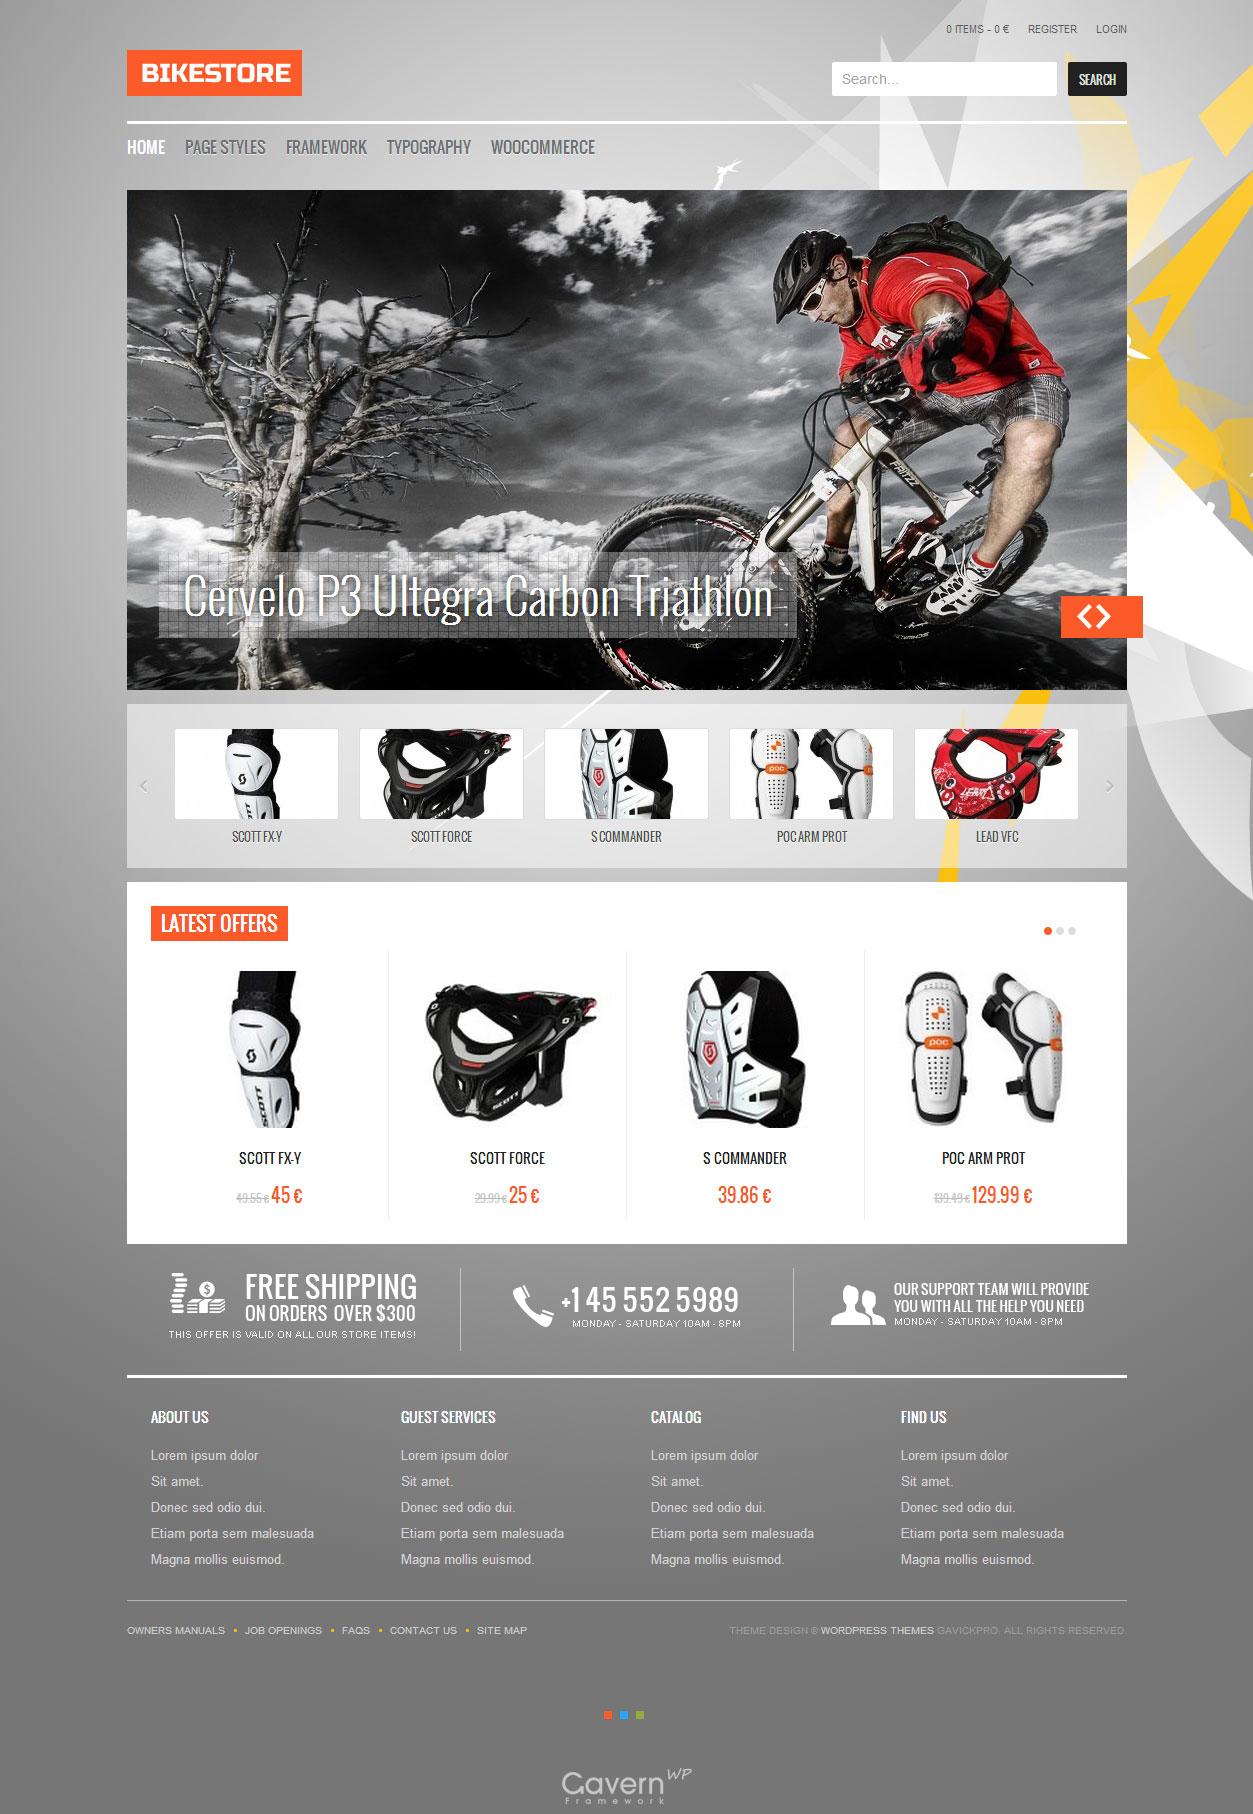 Bike Store Responsive WordPress eCommerce Theme - GavickPro Free Demo